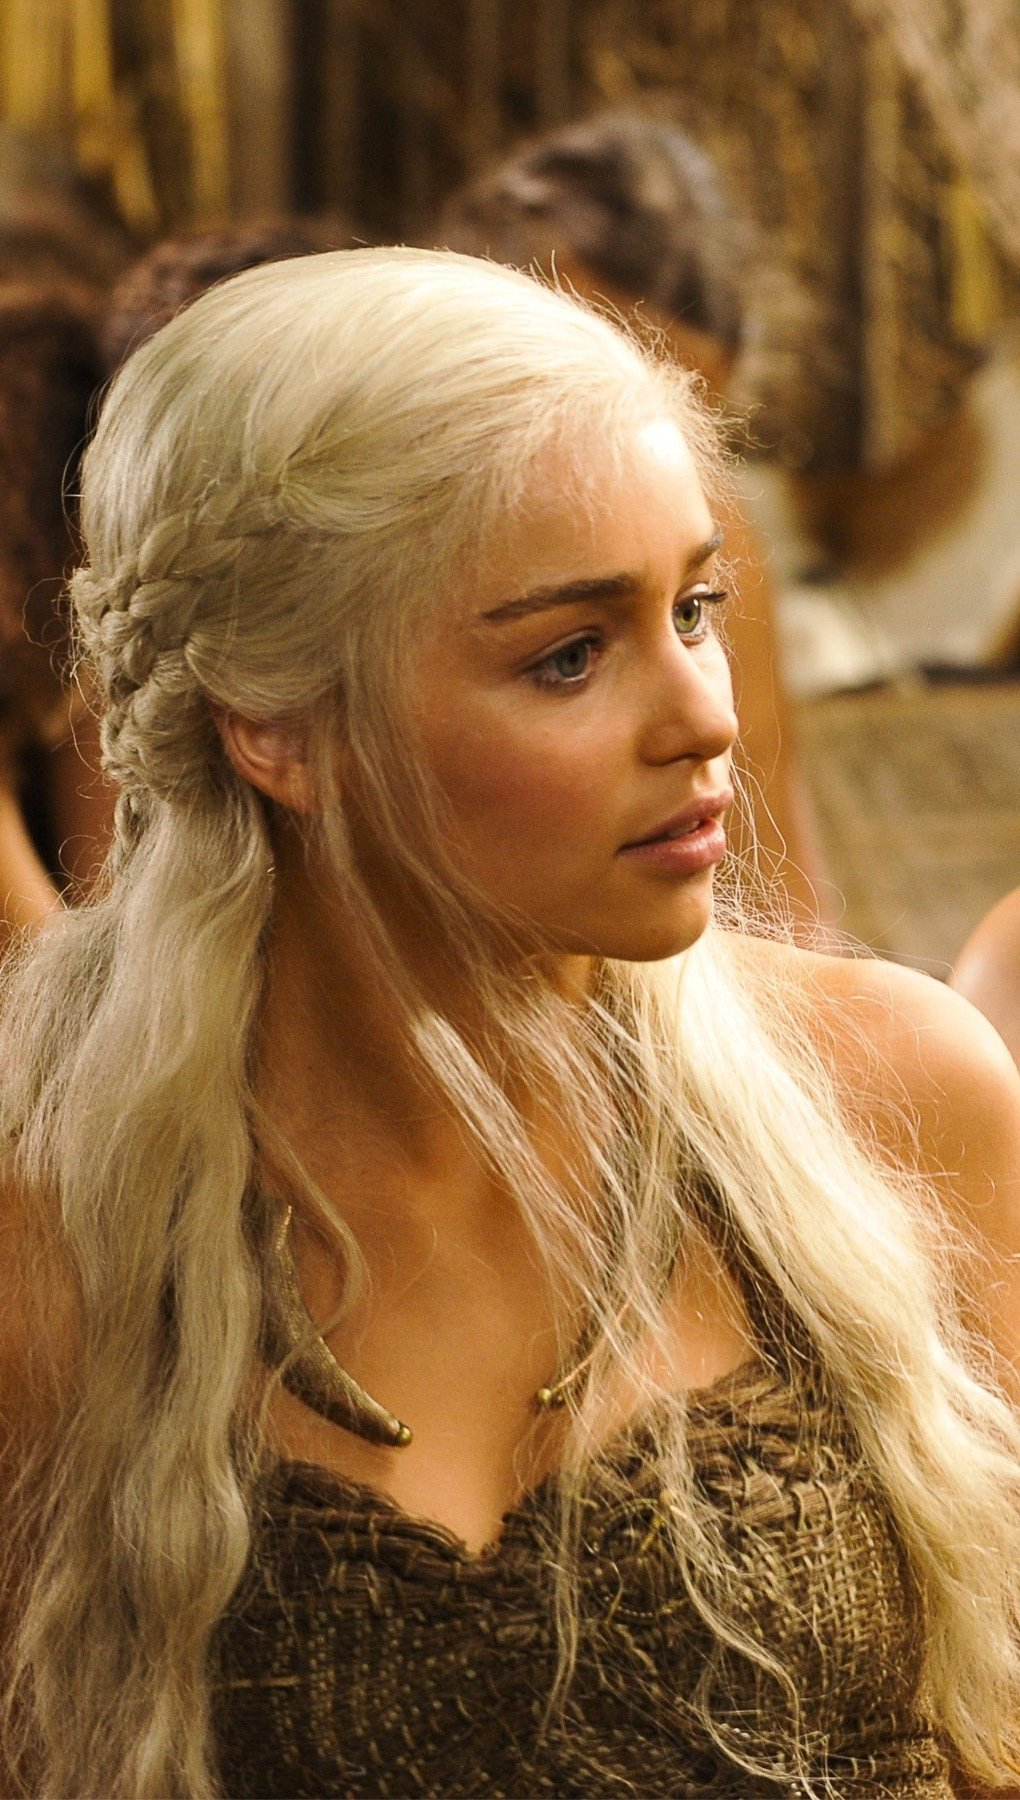 Wallpaper Daenerys targaryen in the first season Vertical